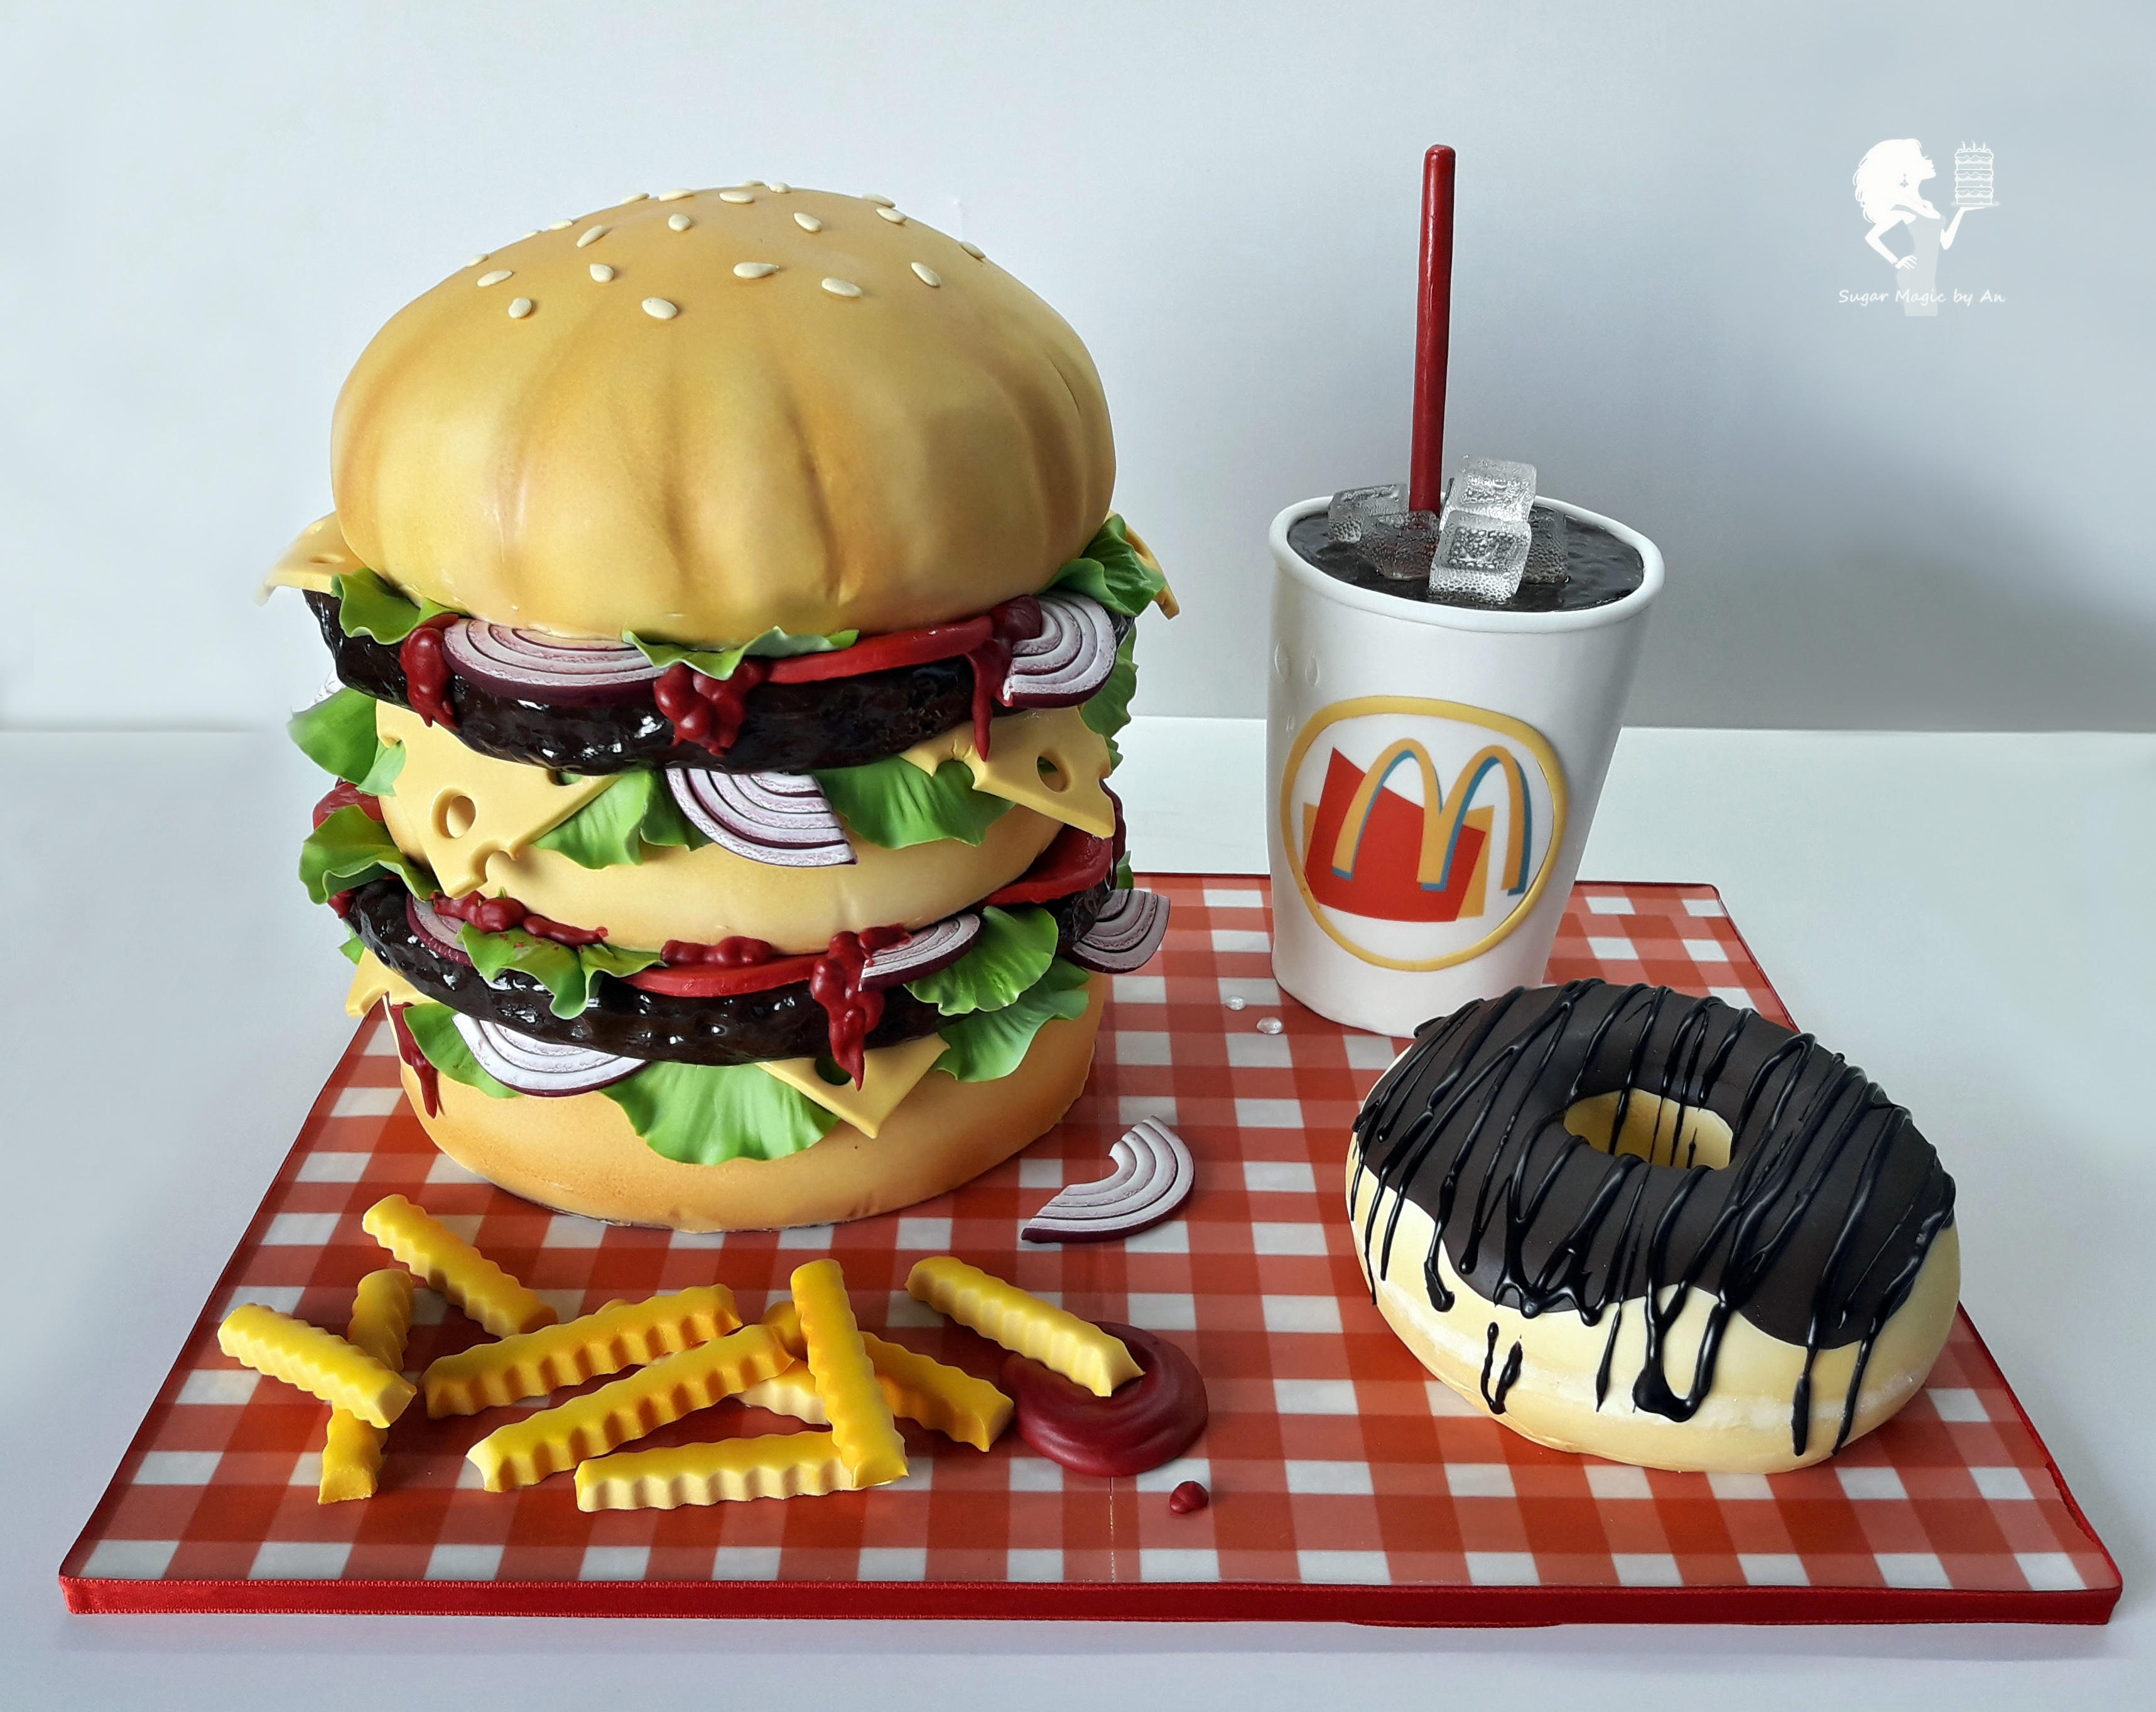 Hamburger shaped fondant cake